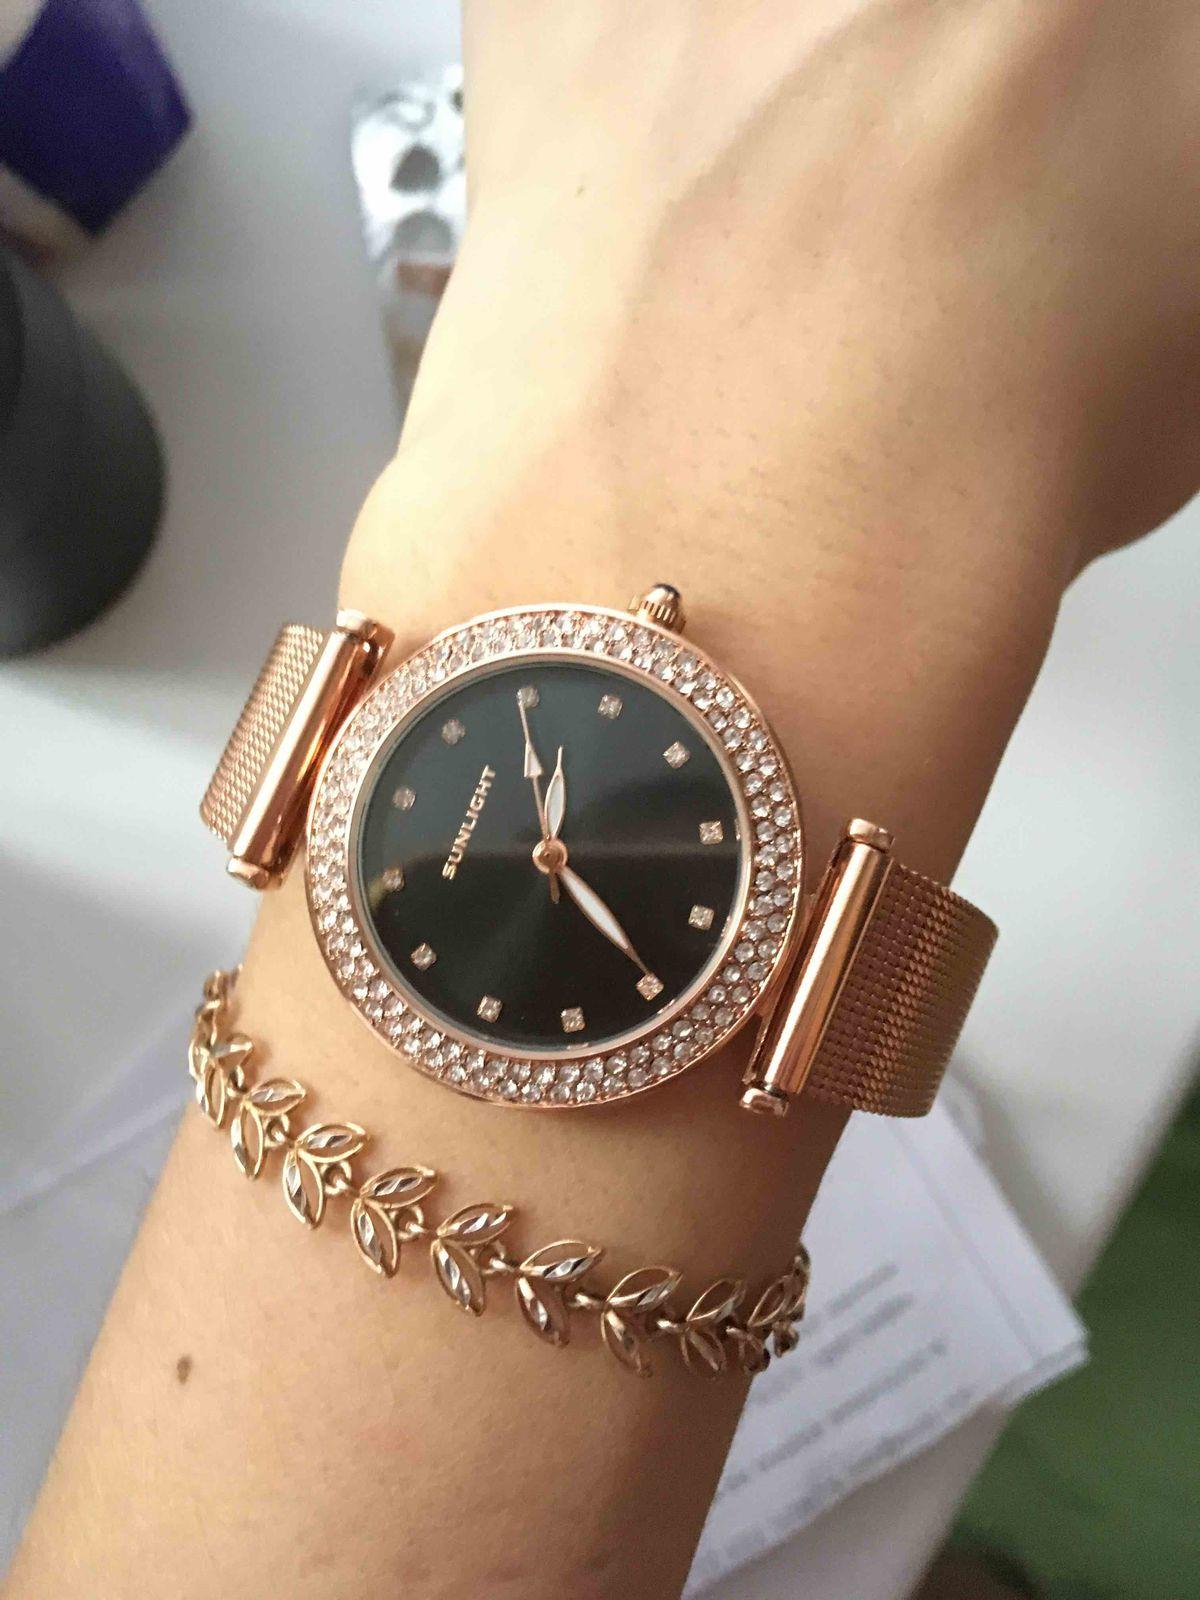 Замечательные часы)